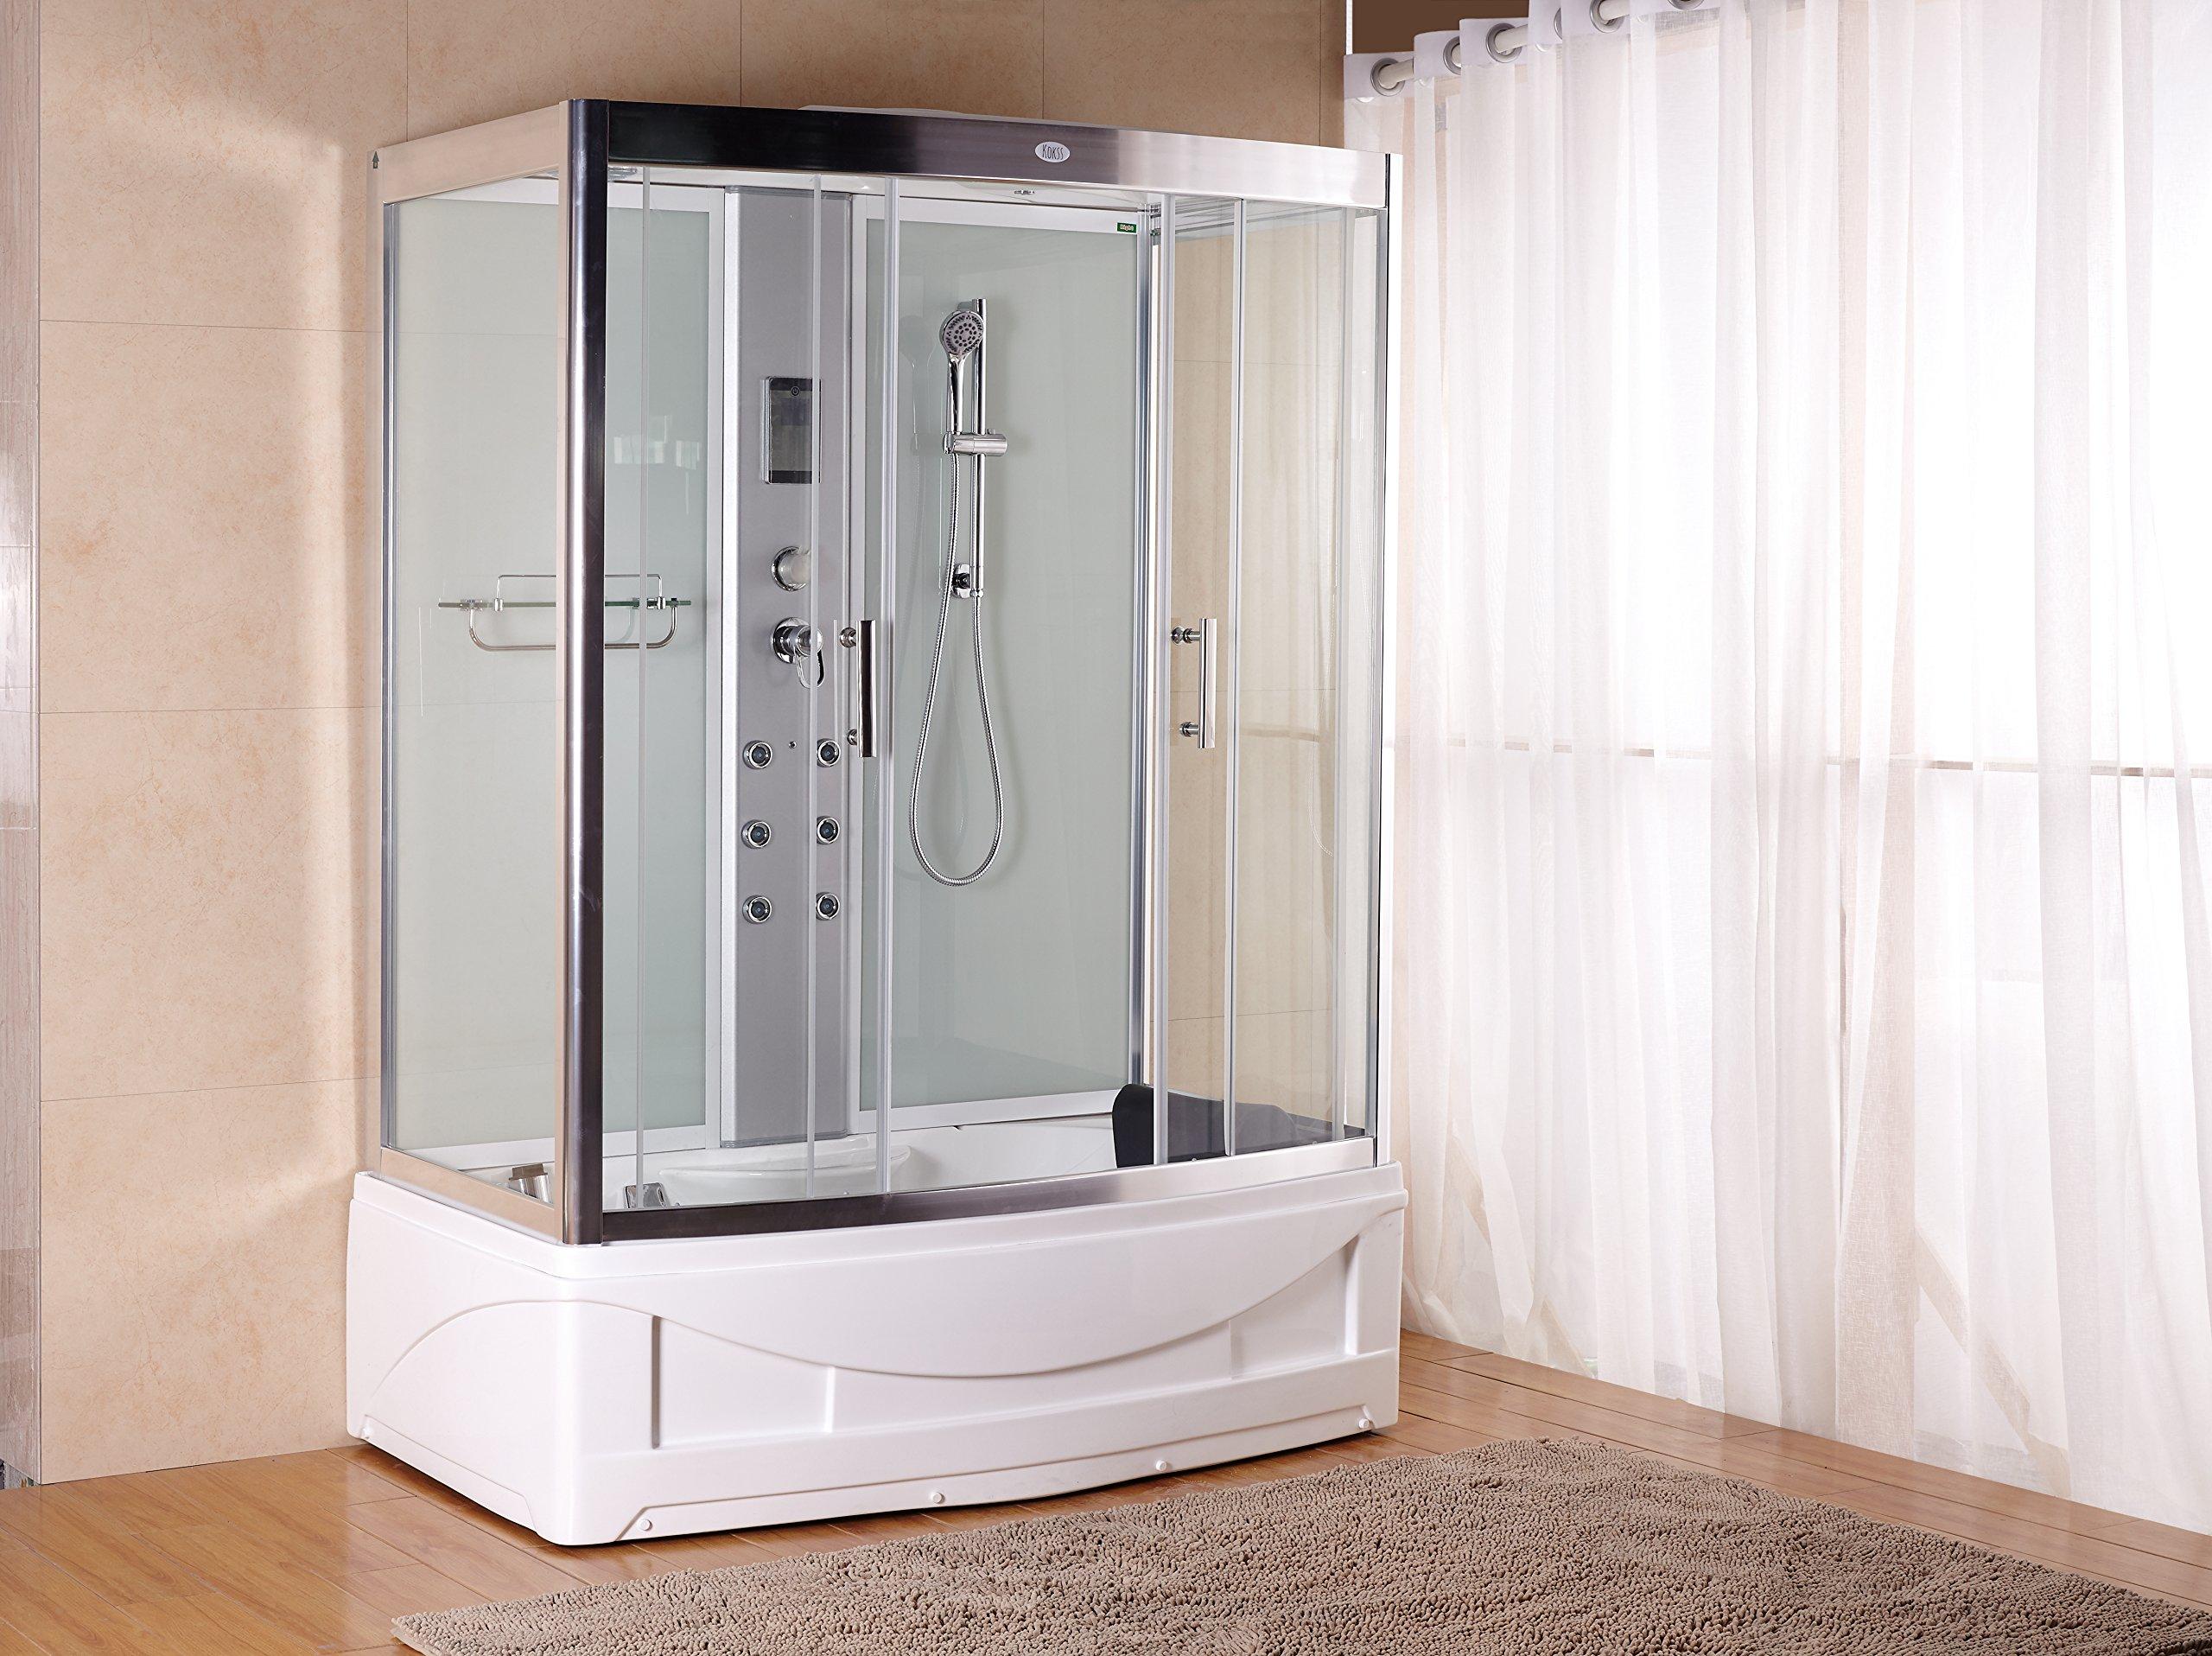 Luxury KBM 9001 Pure White Bathtub Faucet, Steam Shower Enclosure unit (60'' x 35'') with 6 Body massage Jets